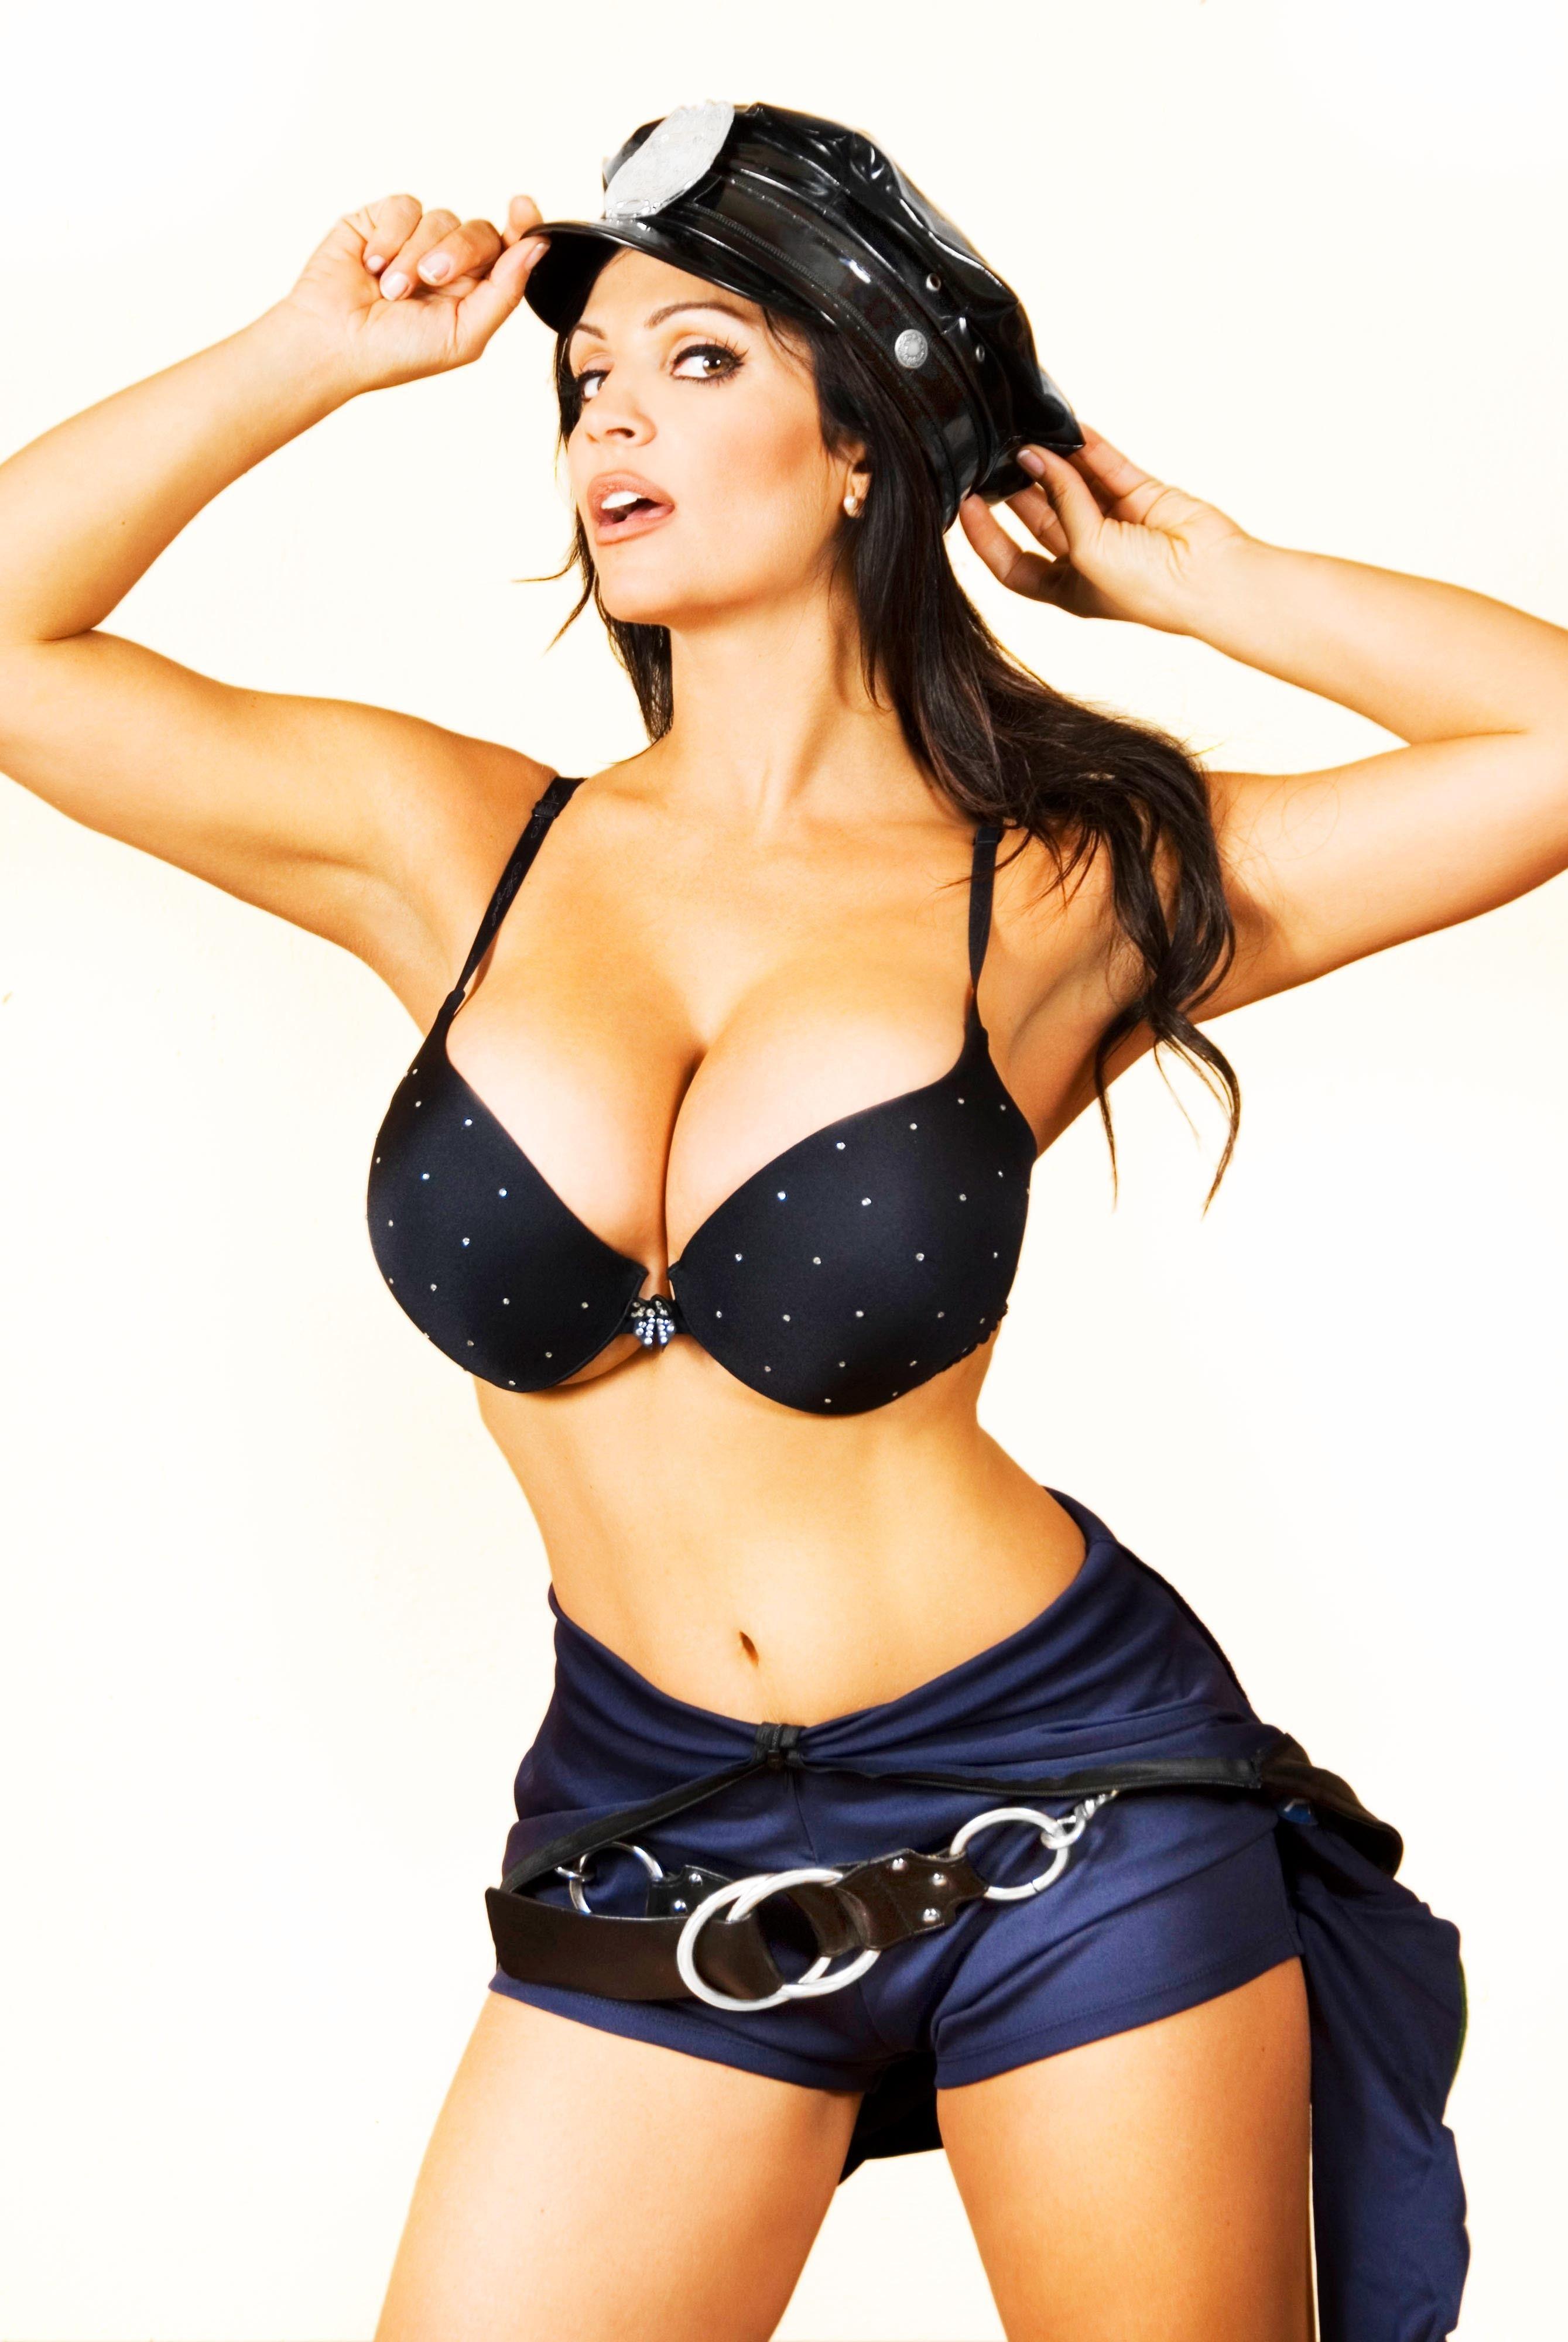 denise milani hot sexy pics